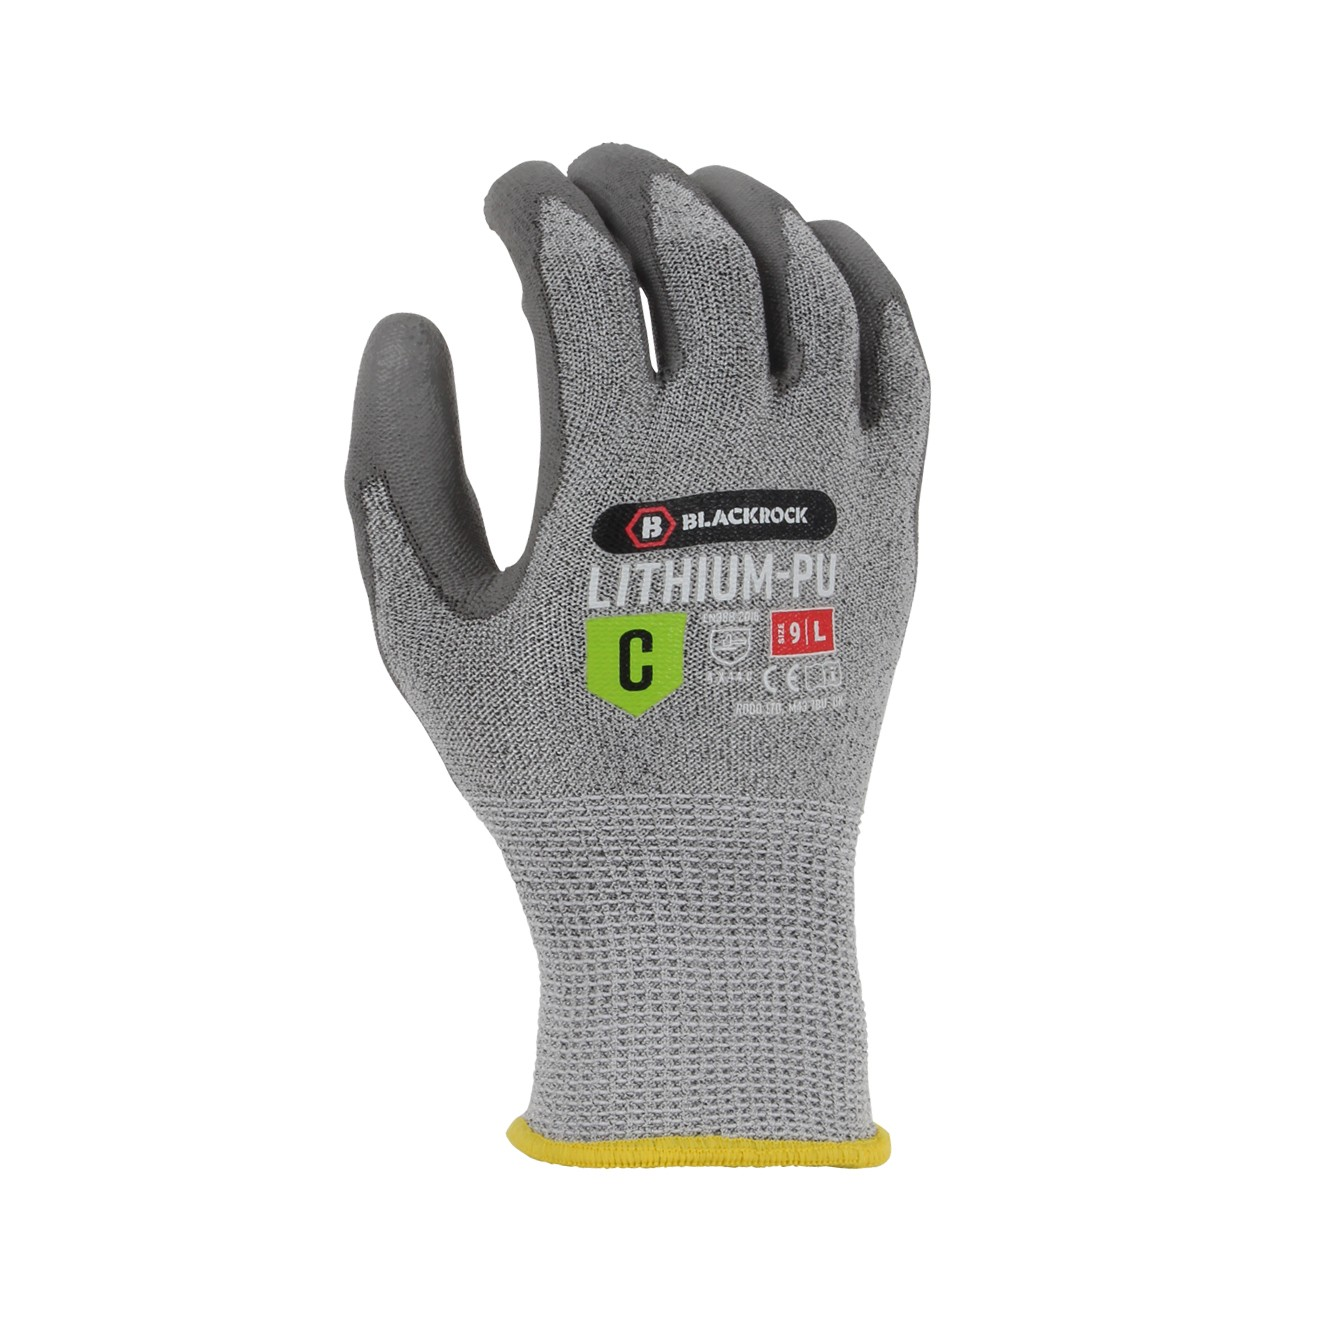 Lithium-PU Cut Resistant Glove